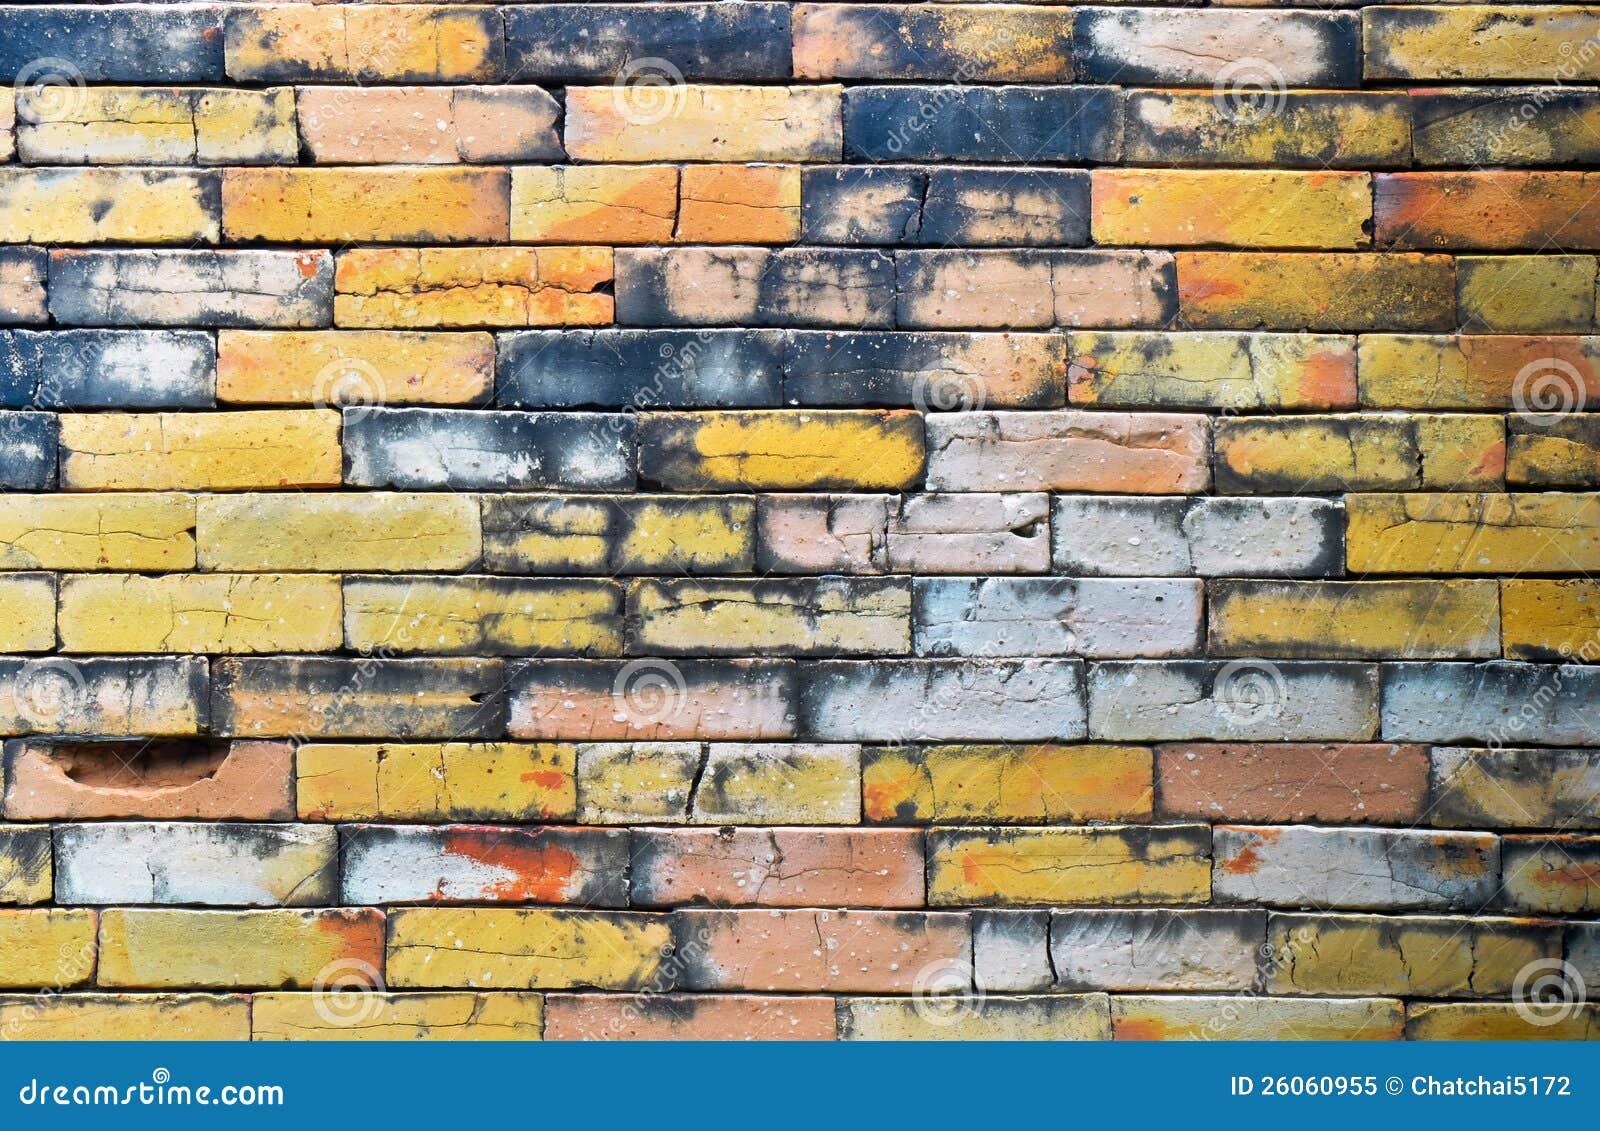 Real Old Brickwall Royalty Free Stock Photo Image 26060955